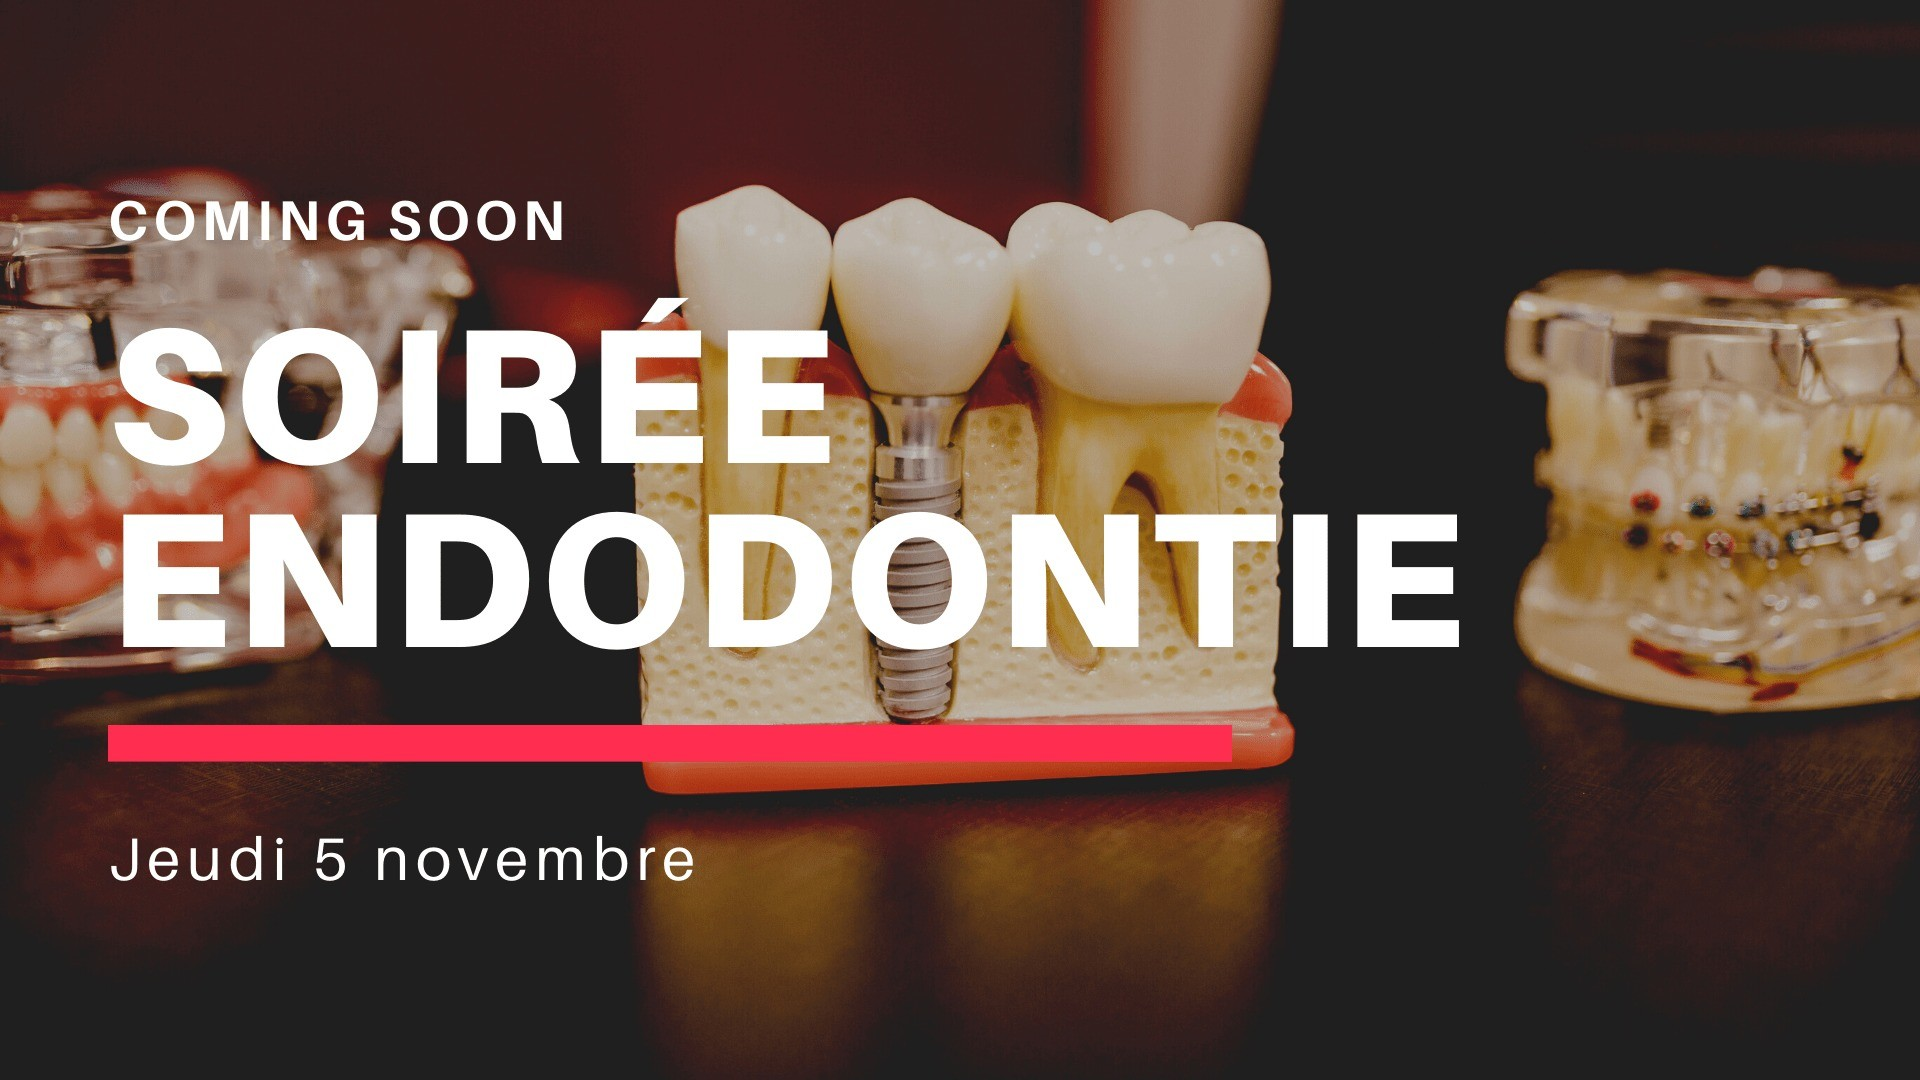 Soirée endodontie